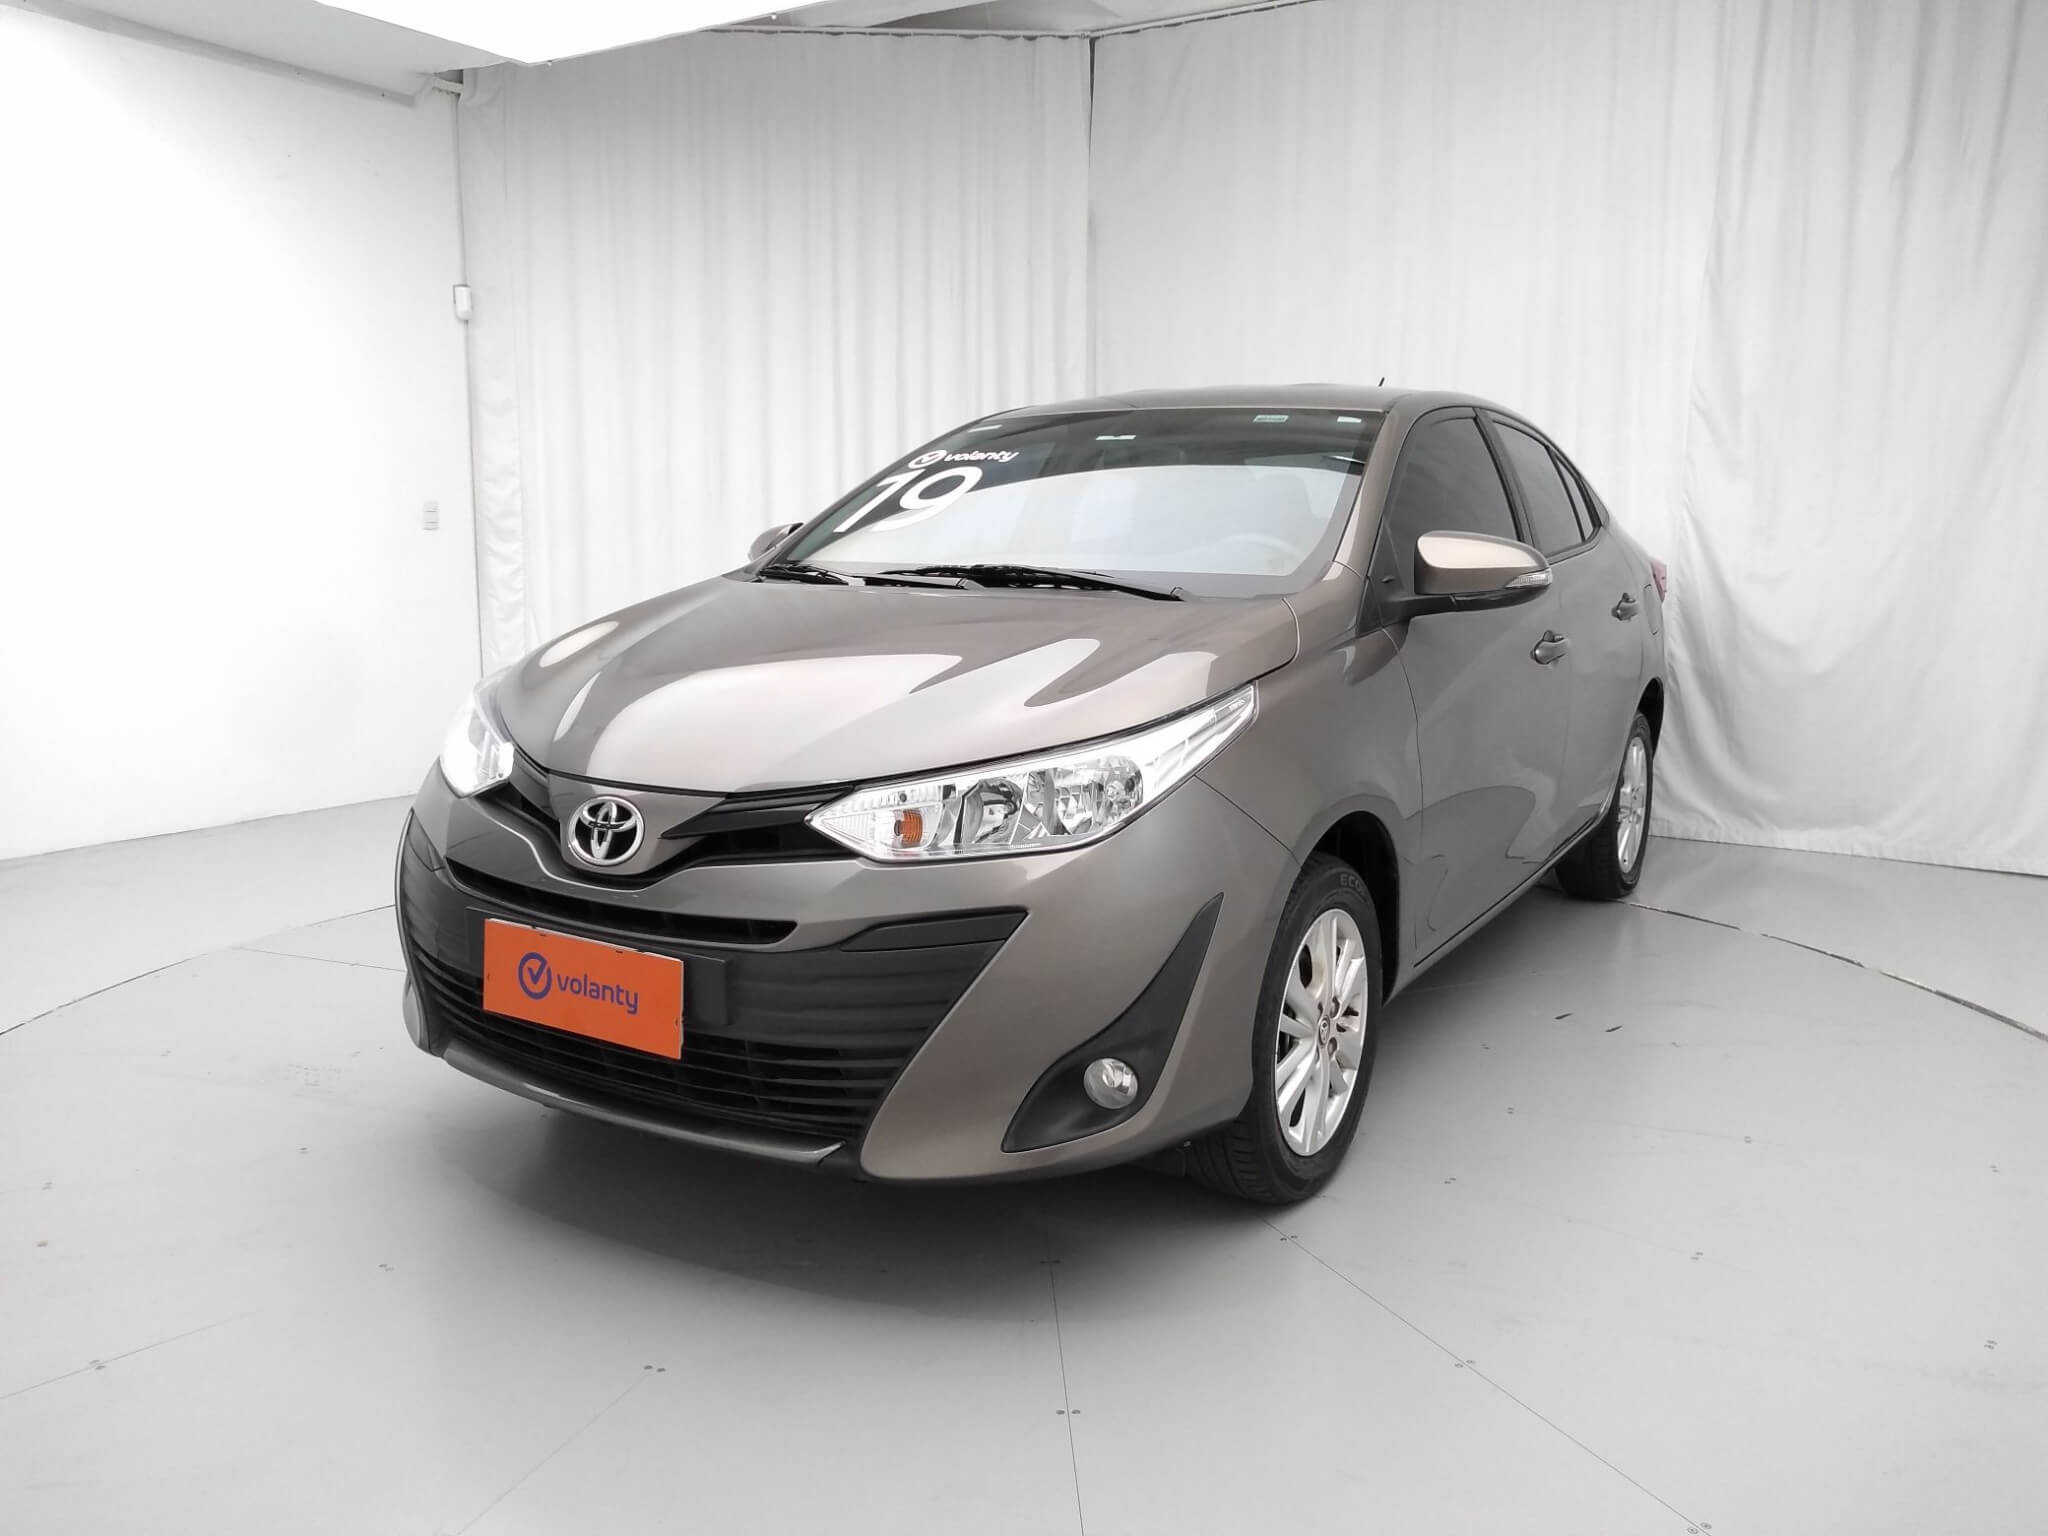 Imagem do Toyota Yaris